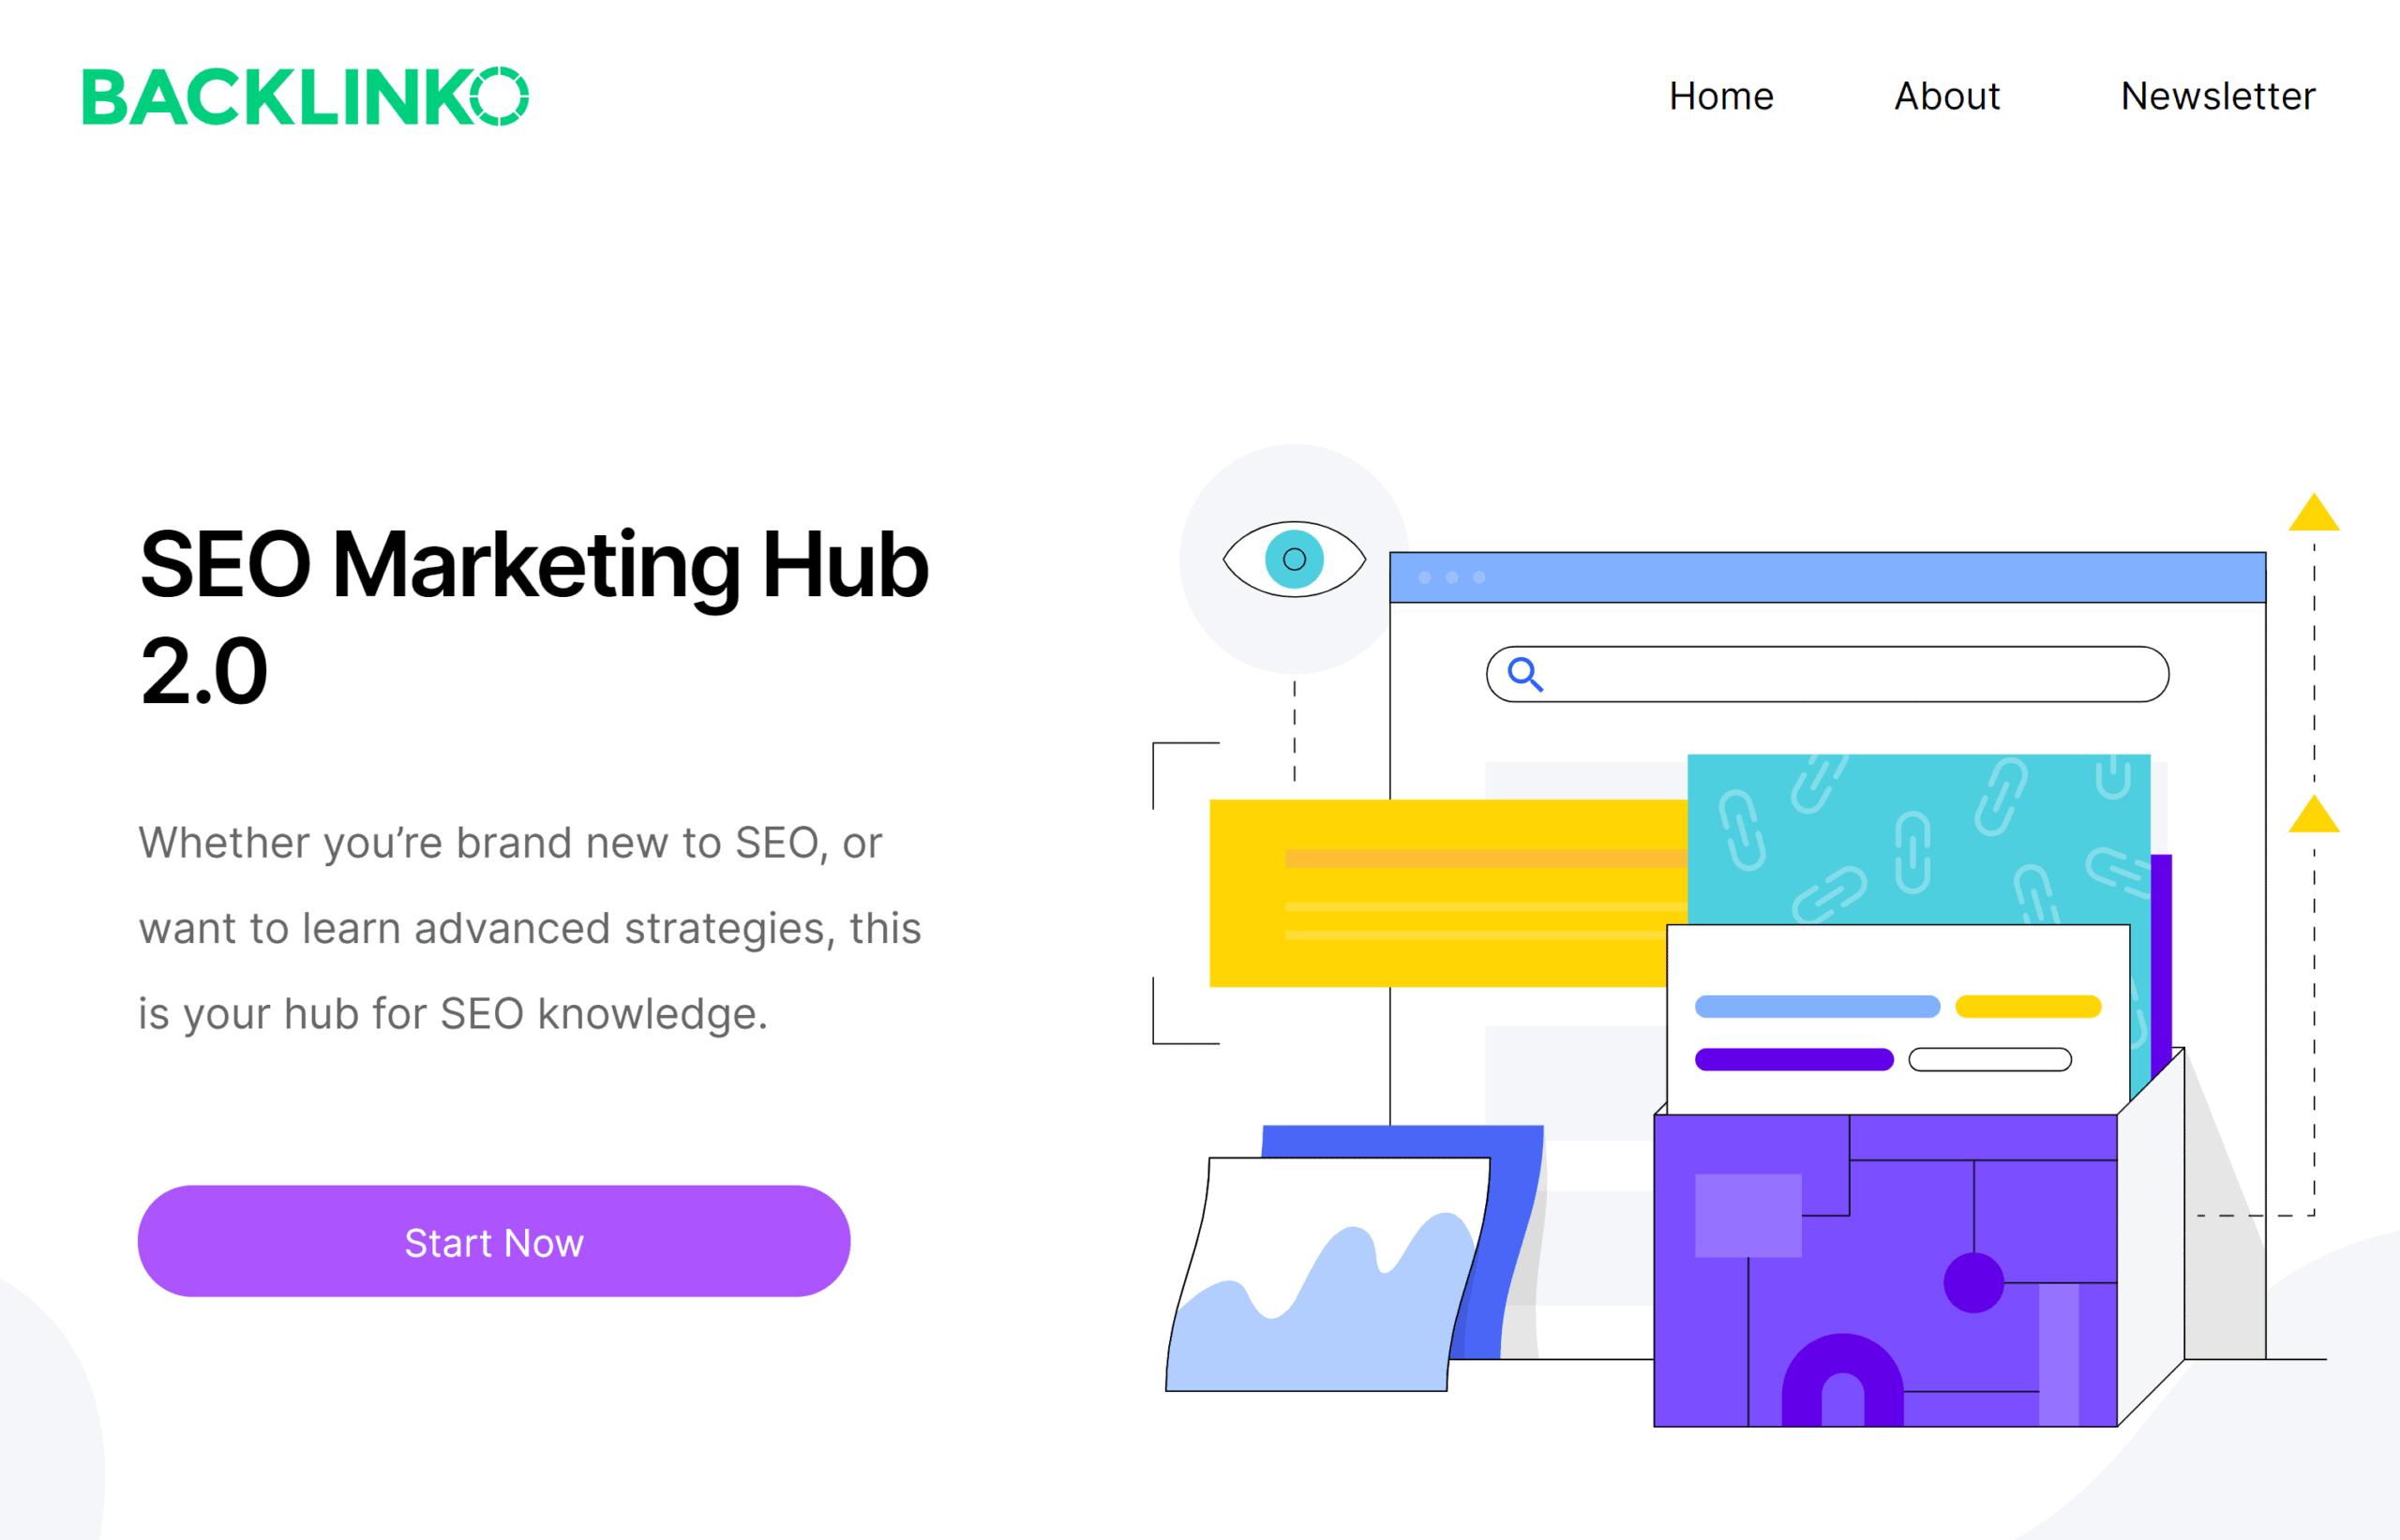 Backlinko – SEO Marketing Hub